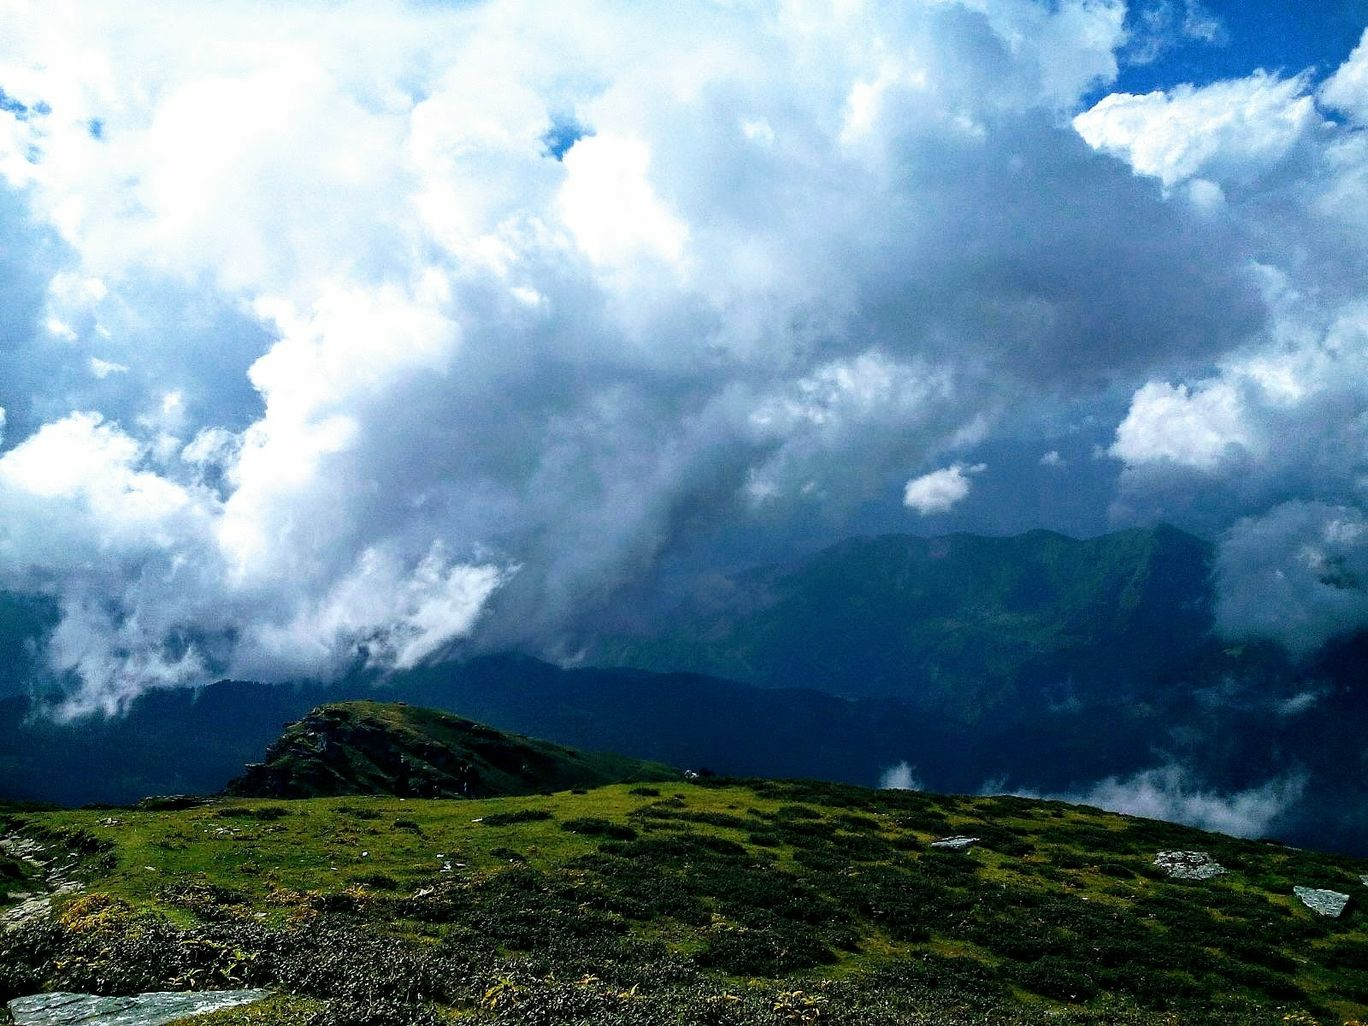 Photo of Chopta By Yati_A_Traveller